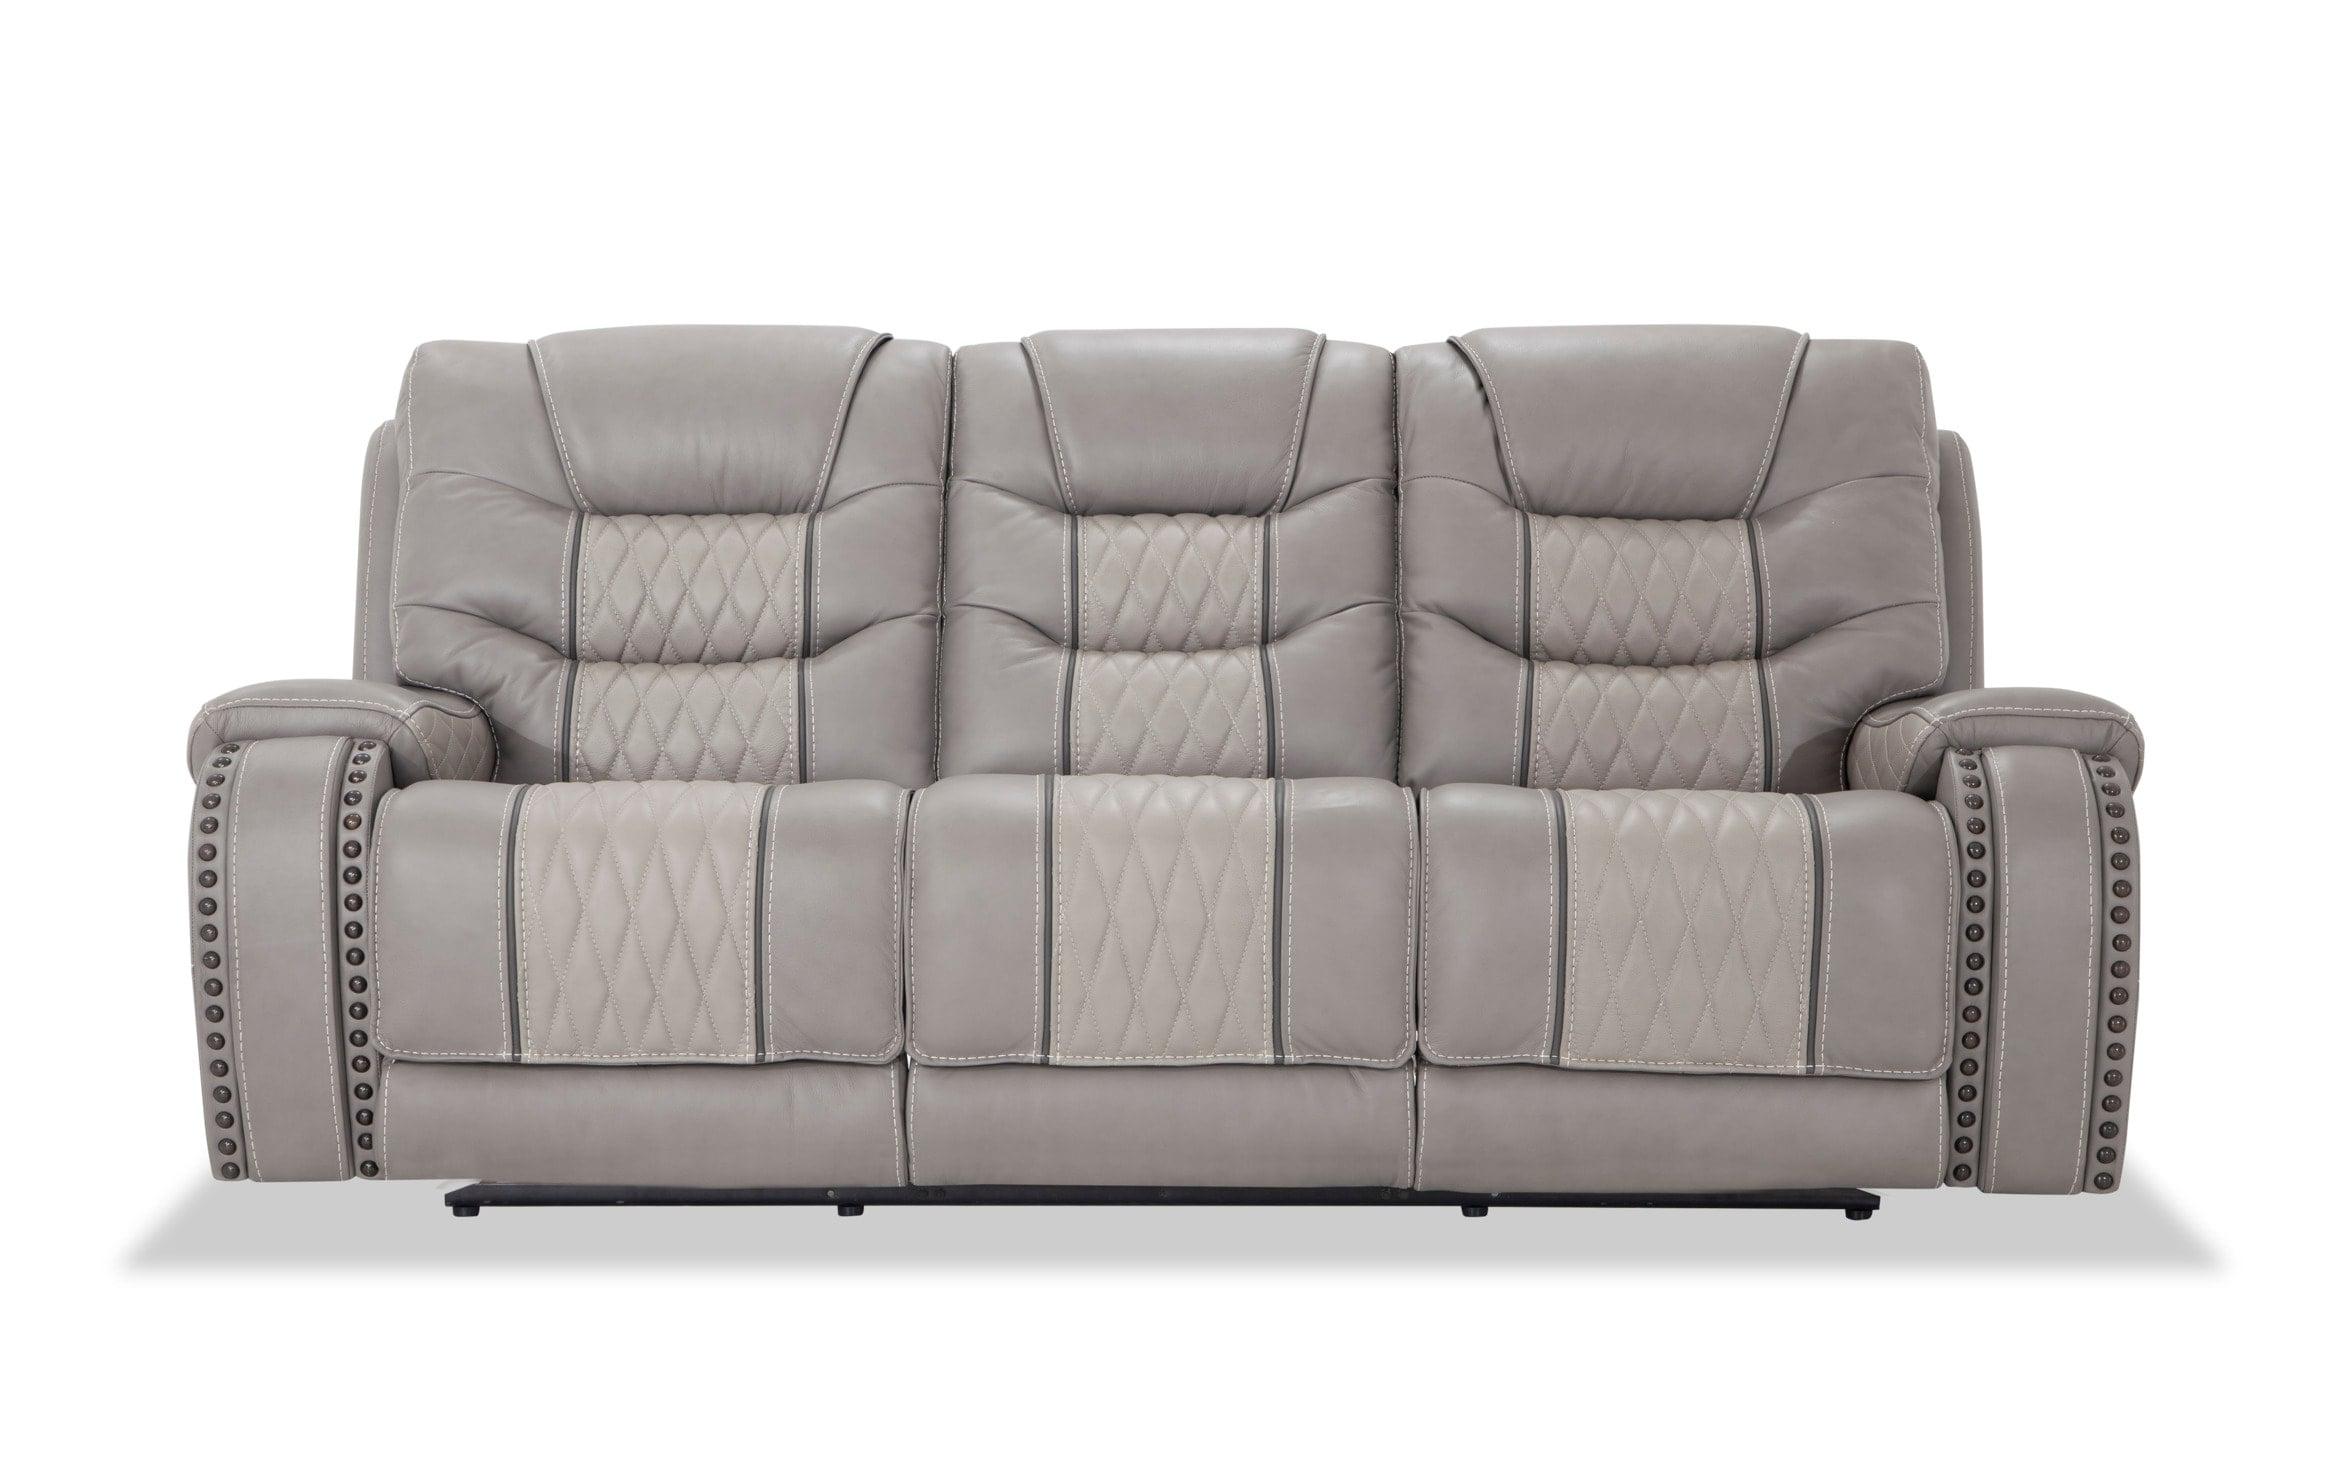 Bobs Furniture Leather Sofa : Trailblazer Gray Leather With Well Known Trailblazer Gray Leather Power Reclining Sofas (View 3 of 15)